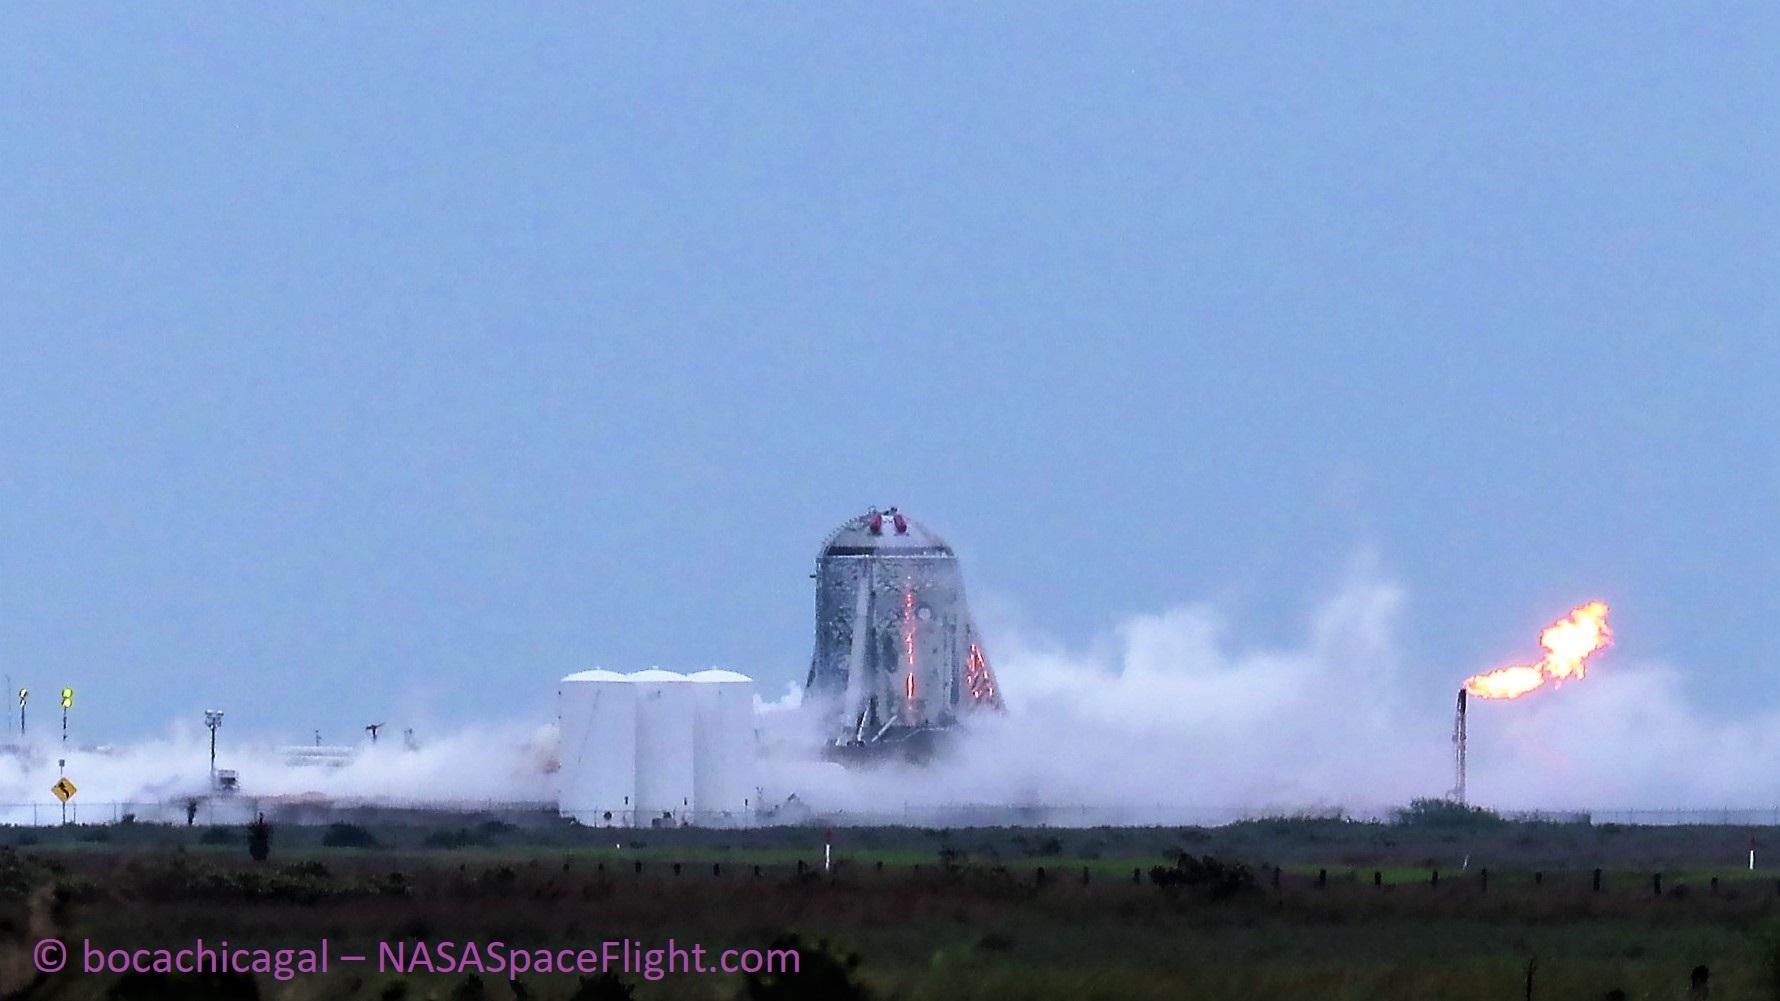 Boca Chica Starhopper testing 040119 (NASASpaceflight – bocachicagal) 2